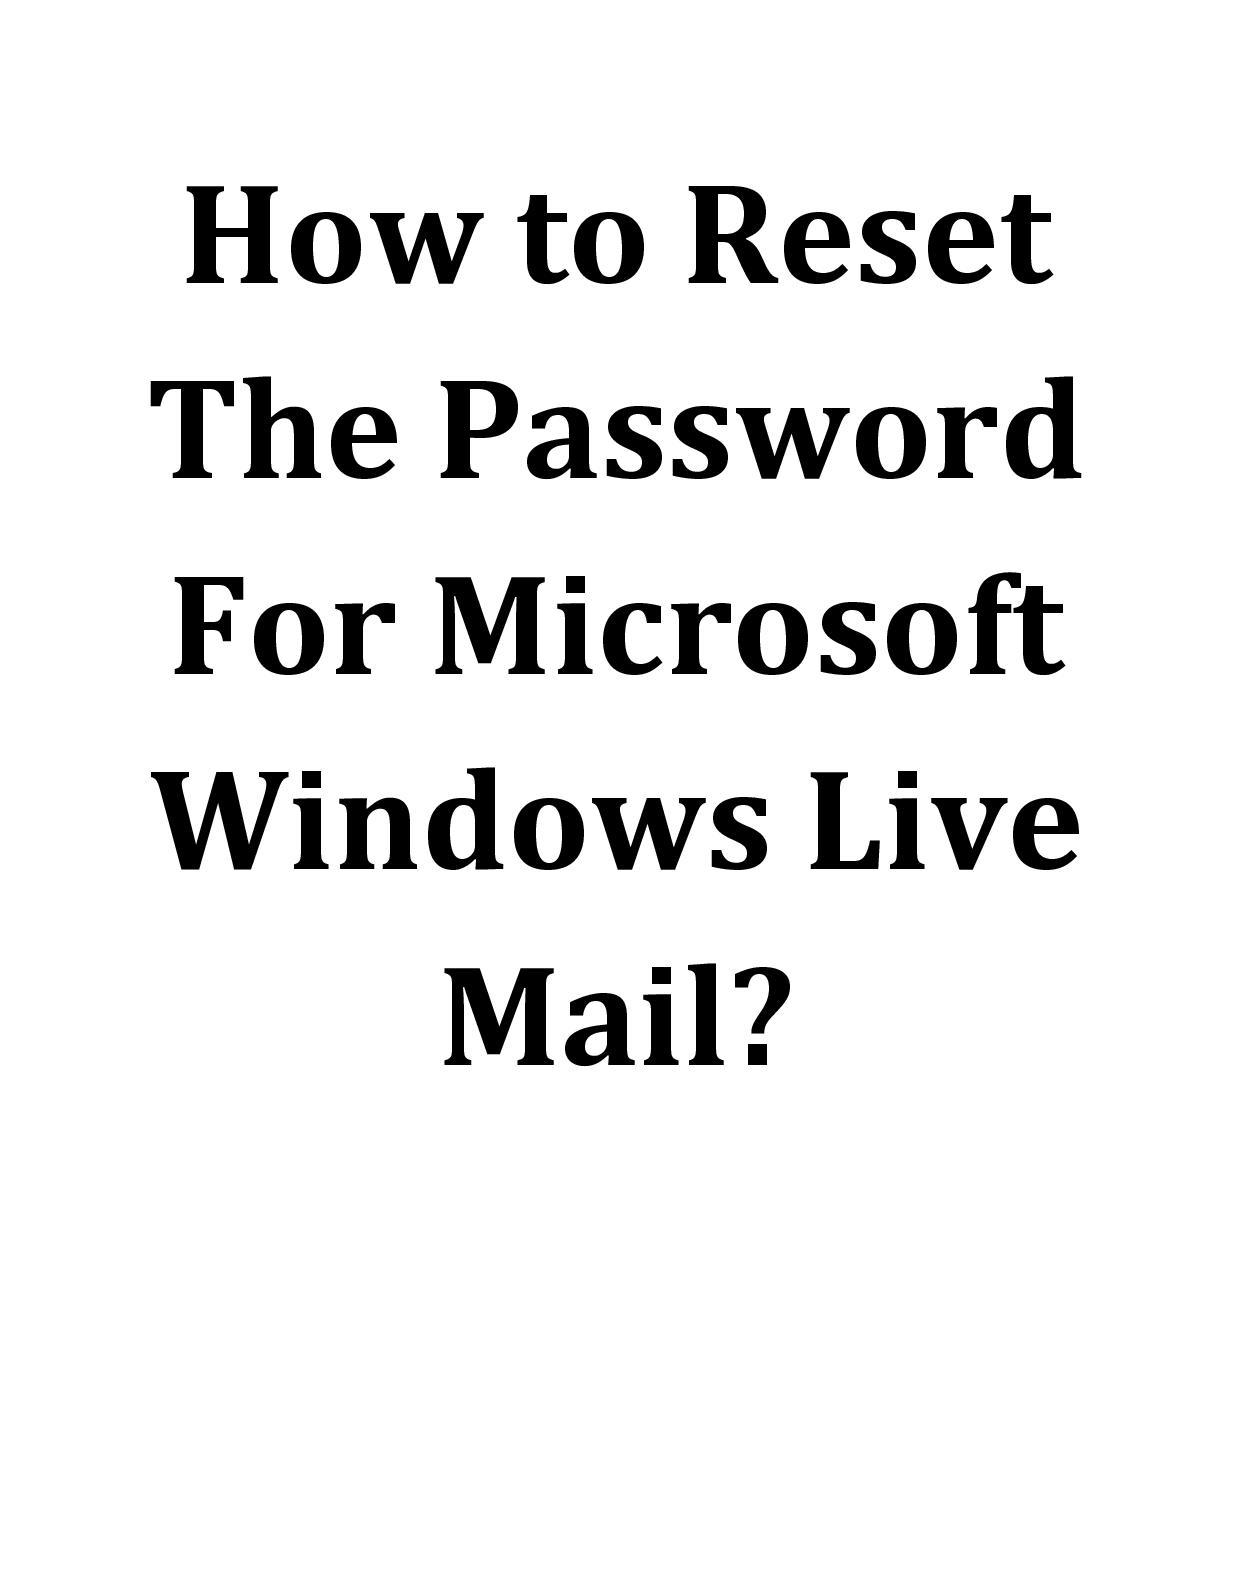 forgotten password on windows live mail